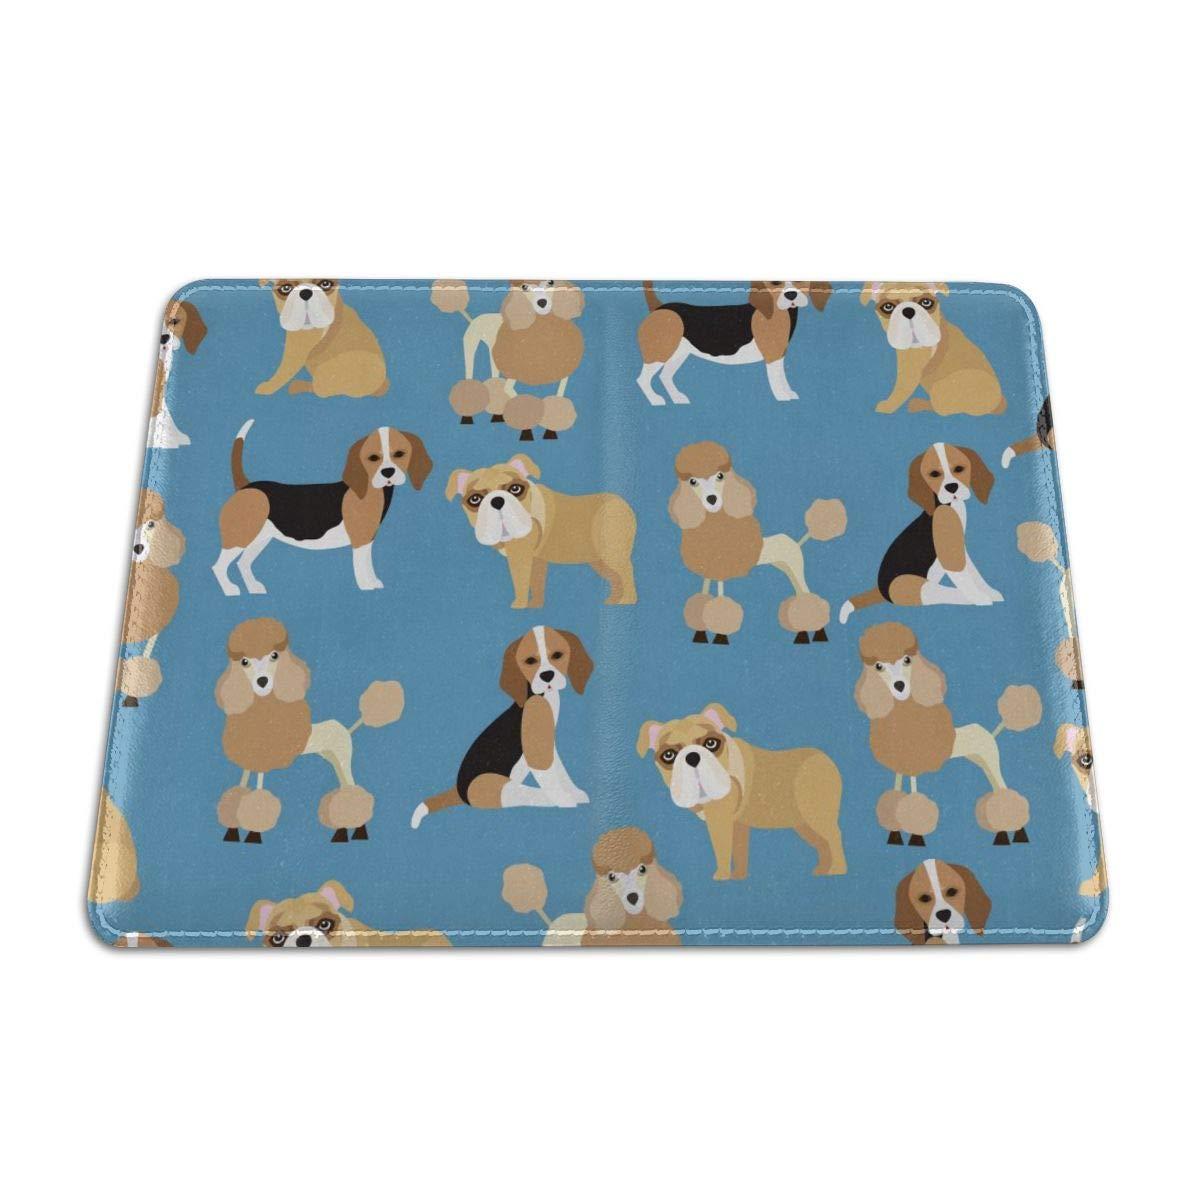 Cute Pet Dog Pattern Genuine Leather Passport Holder Travel Wallet